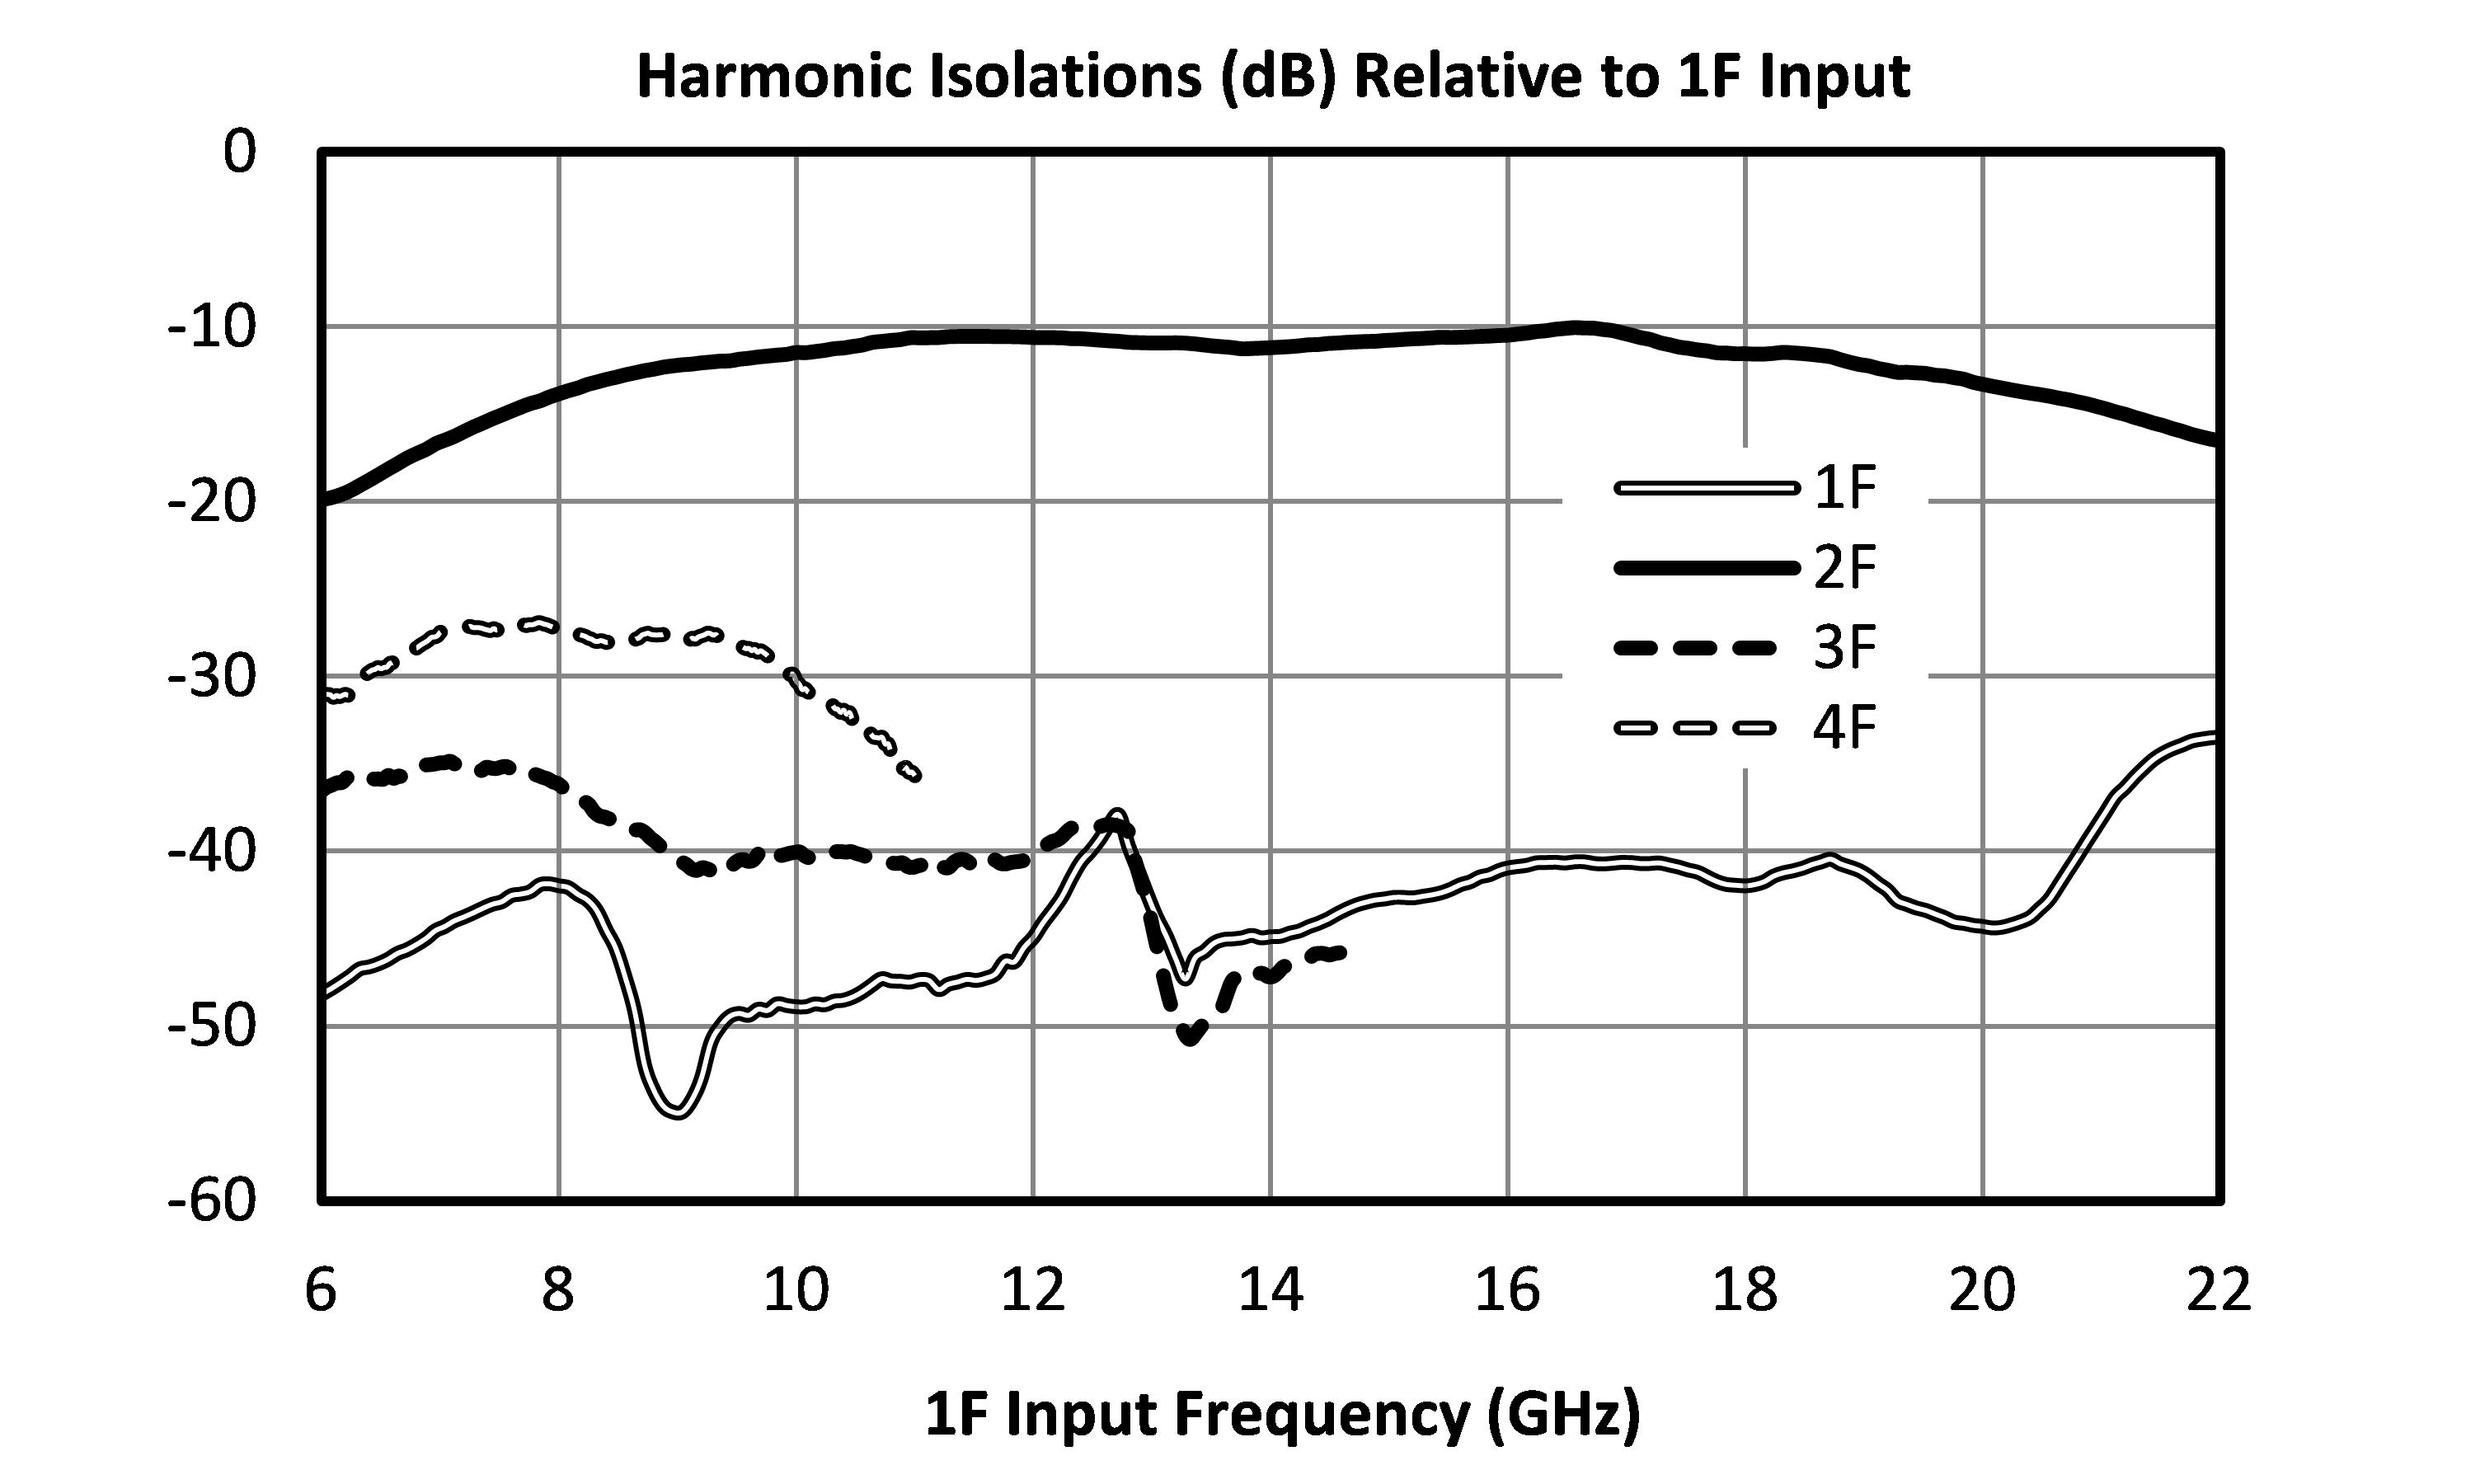 MLD-1640 isolations